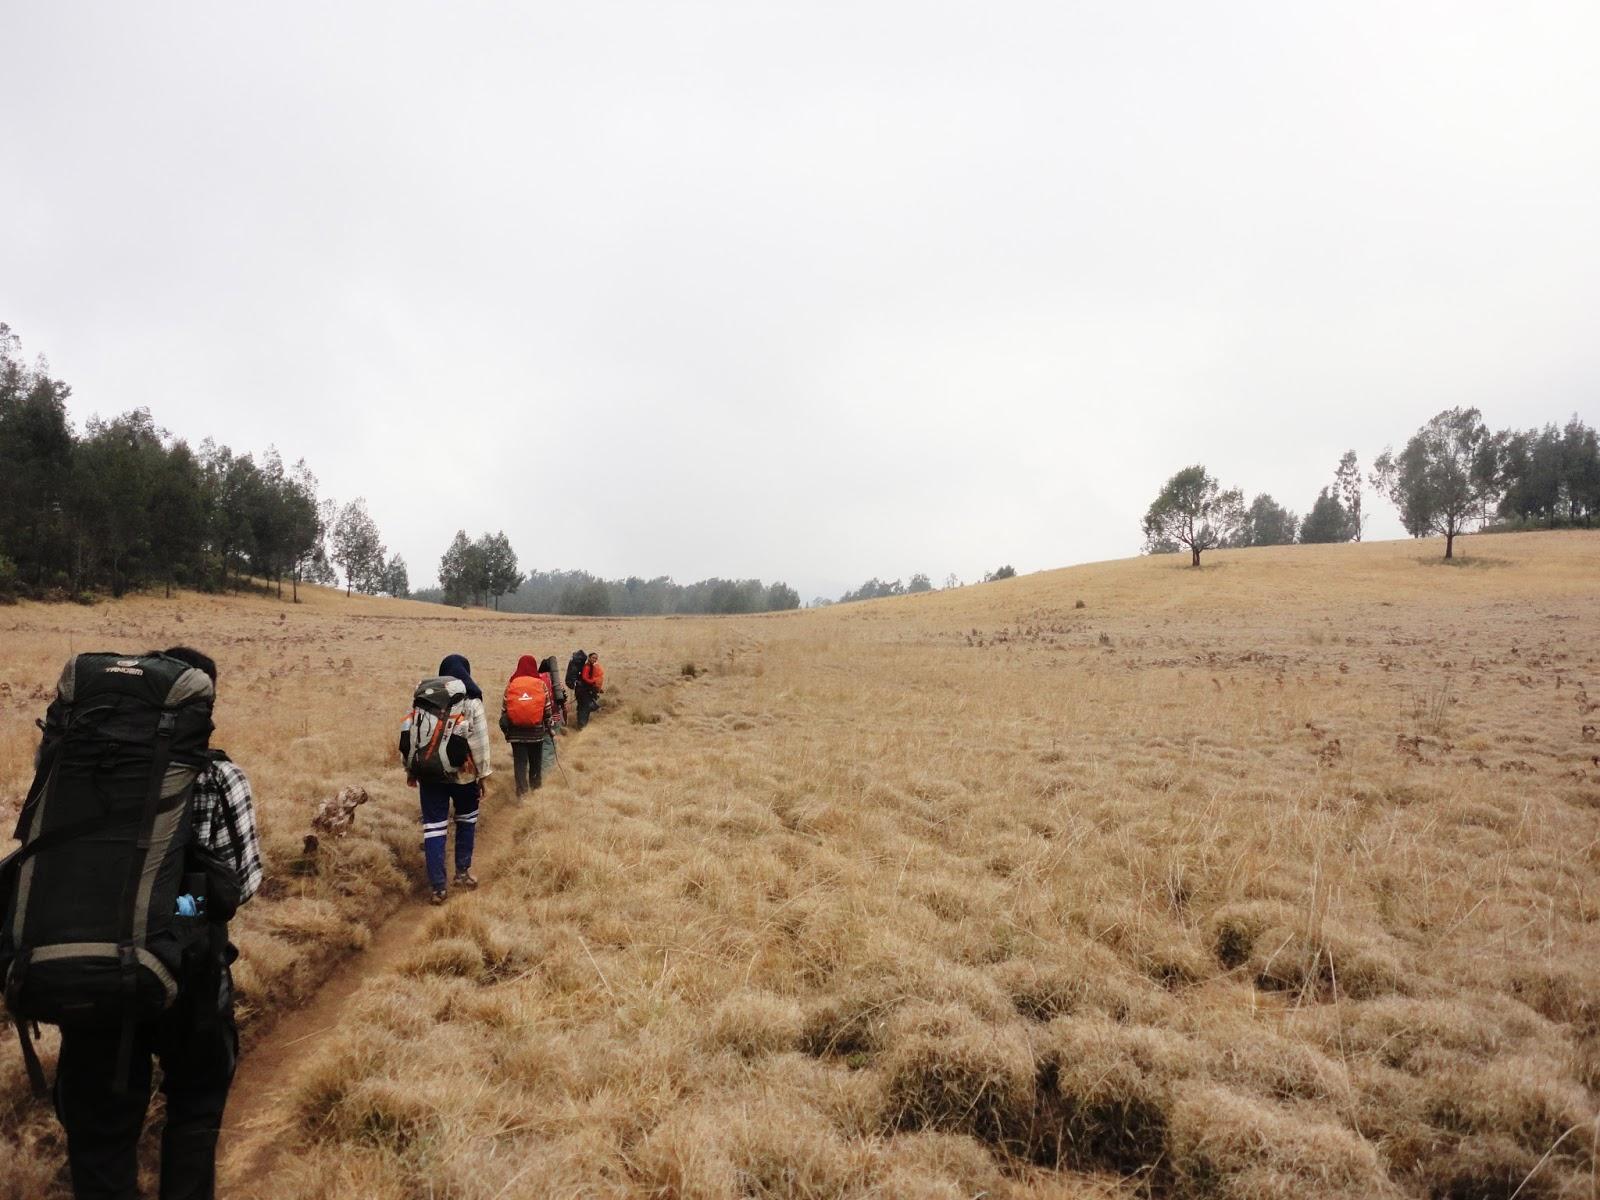 Dataran Tinggi Hyang Argopuro Kuc Blog Gunung Berada Jajaran Wilayah